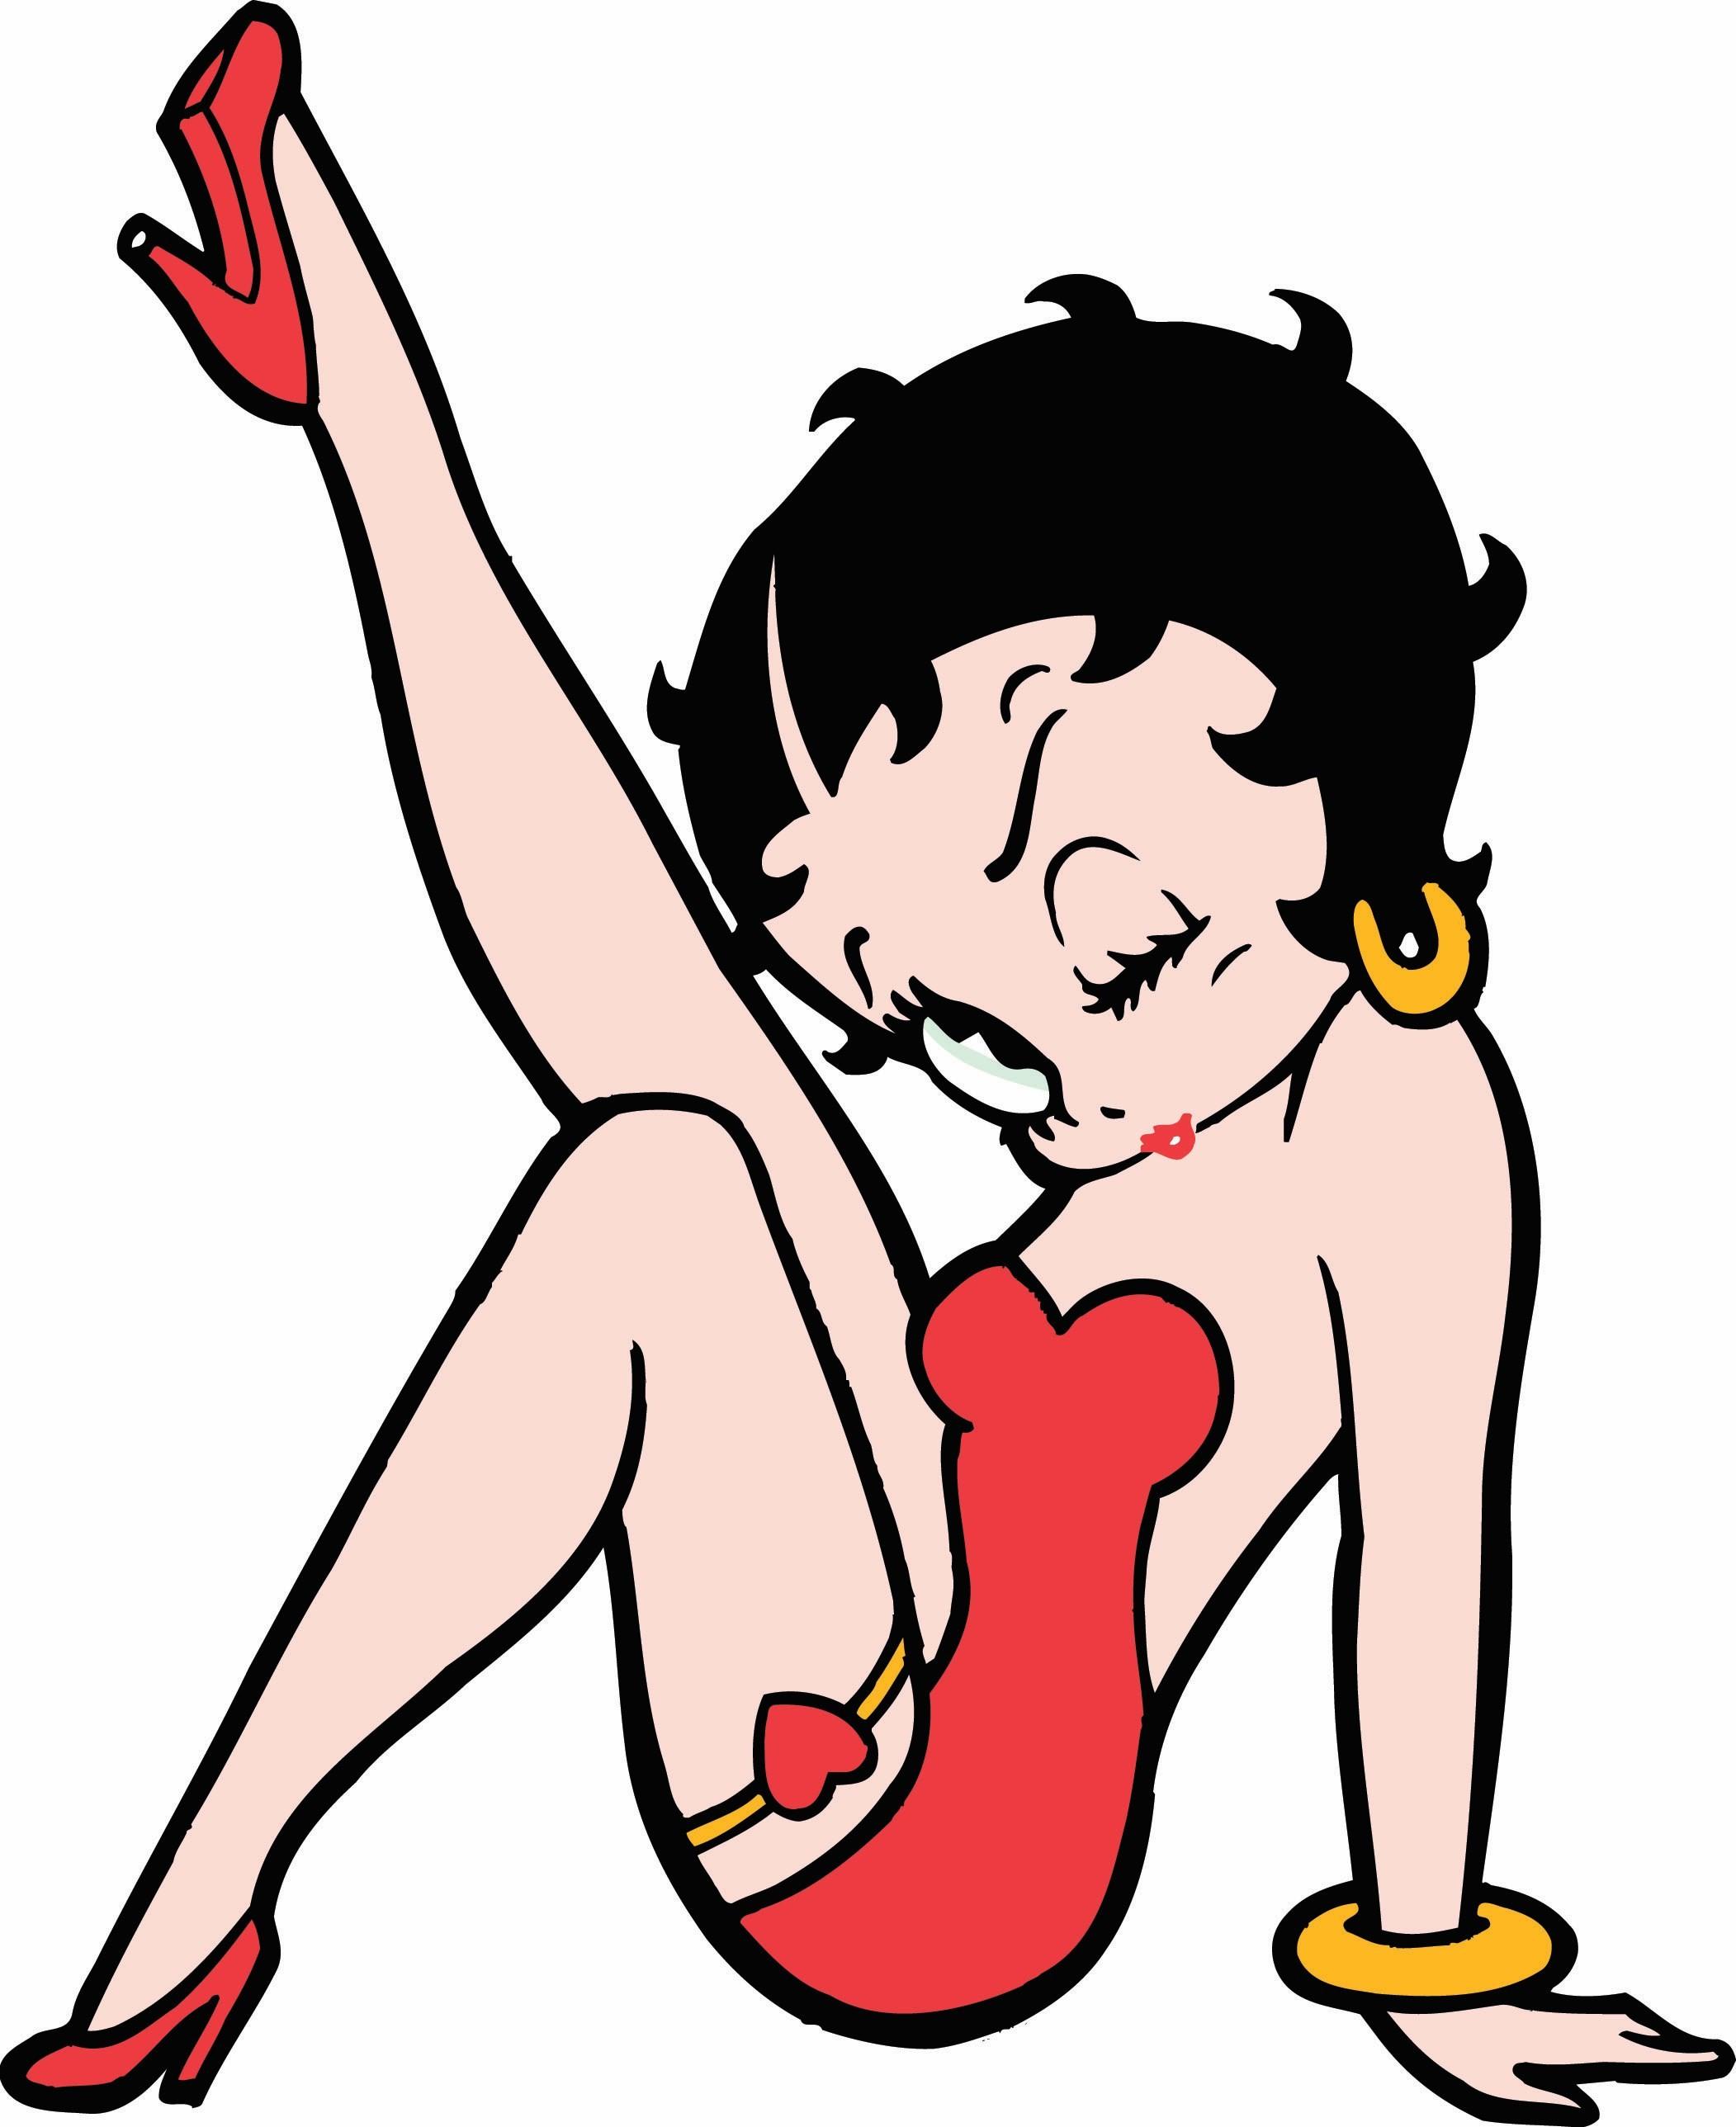 Wallpaper of Betty Boop ·â'